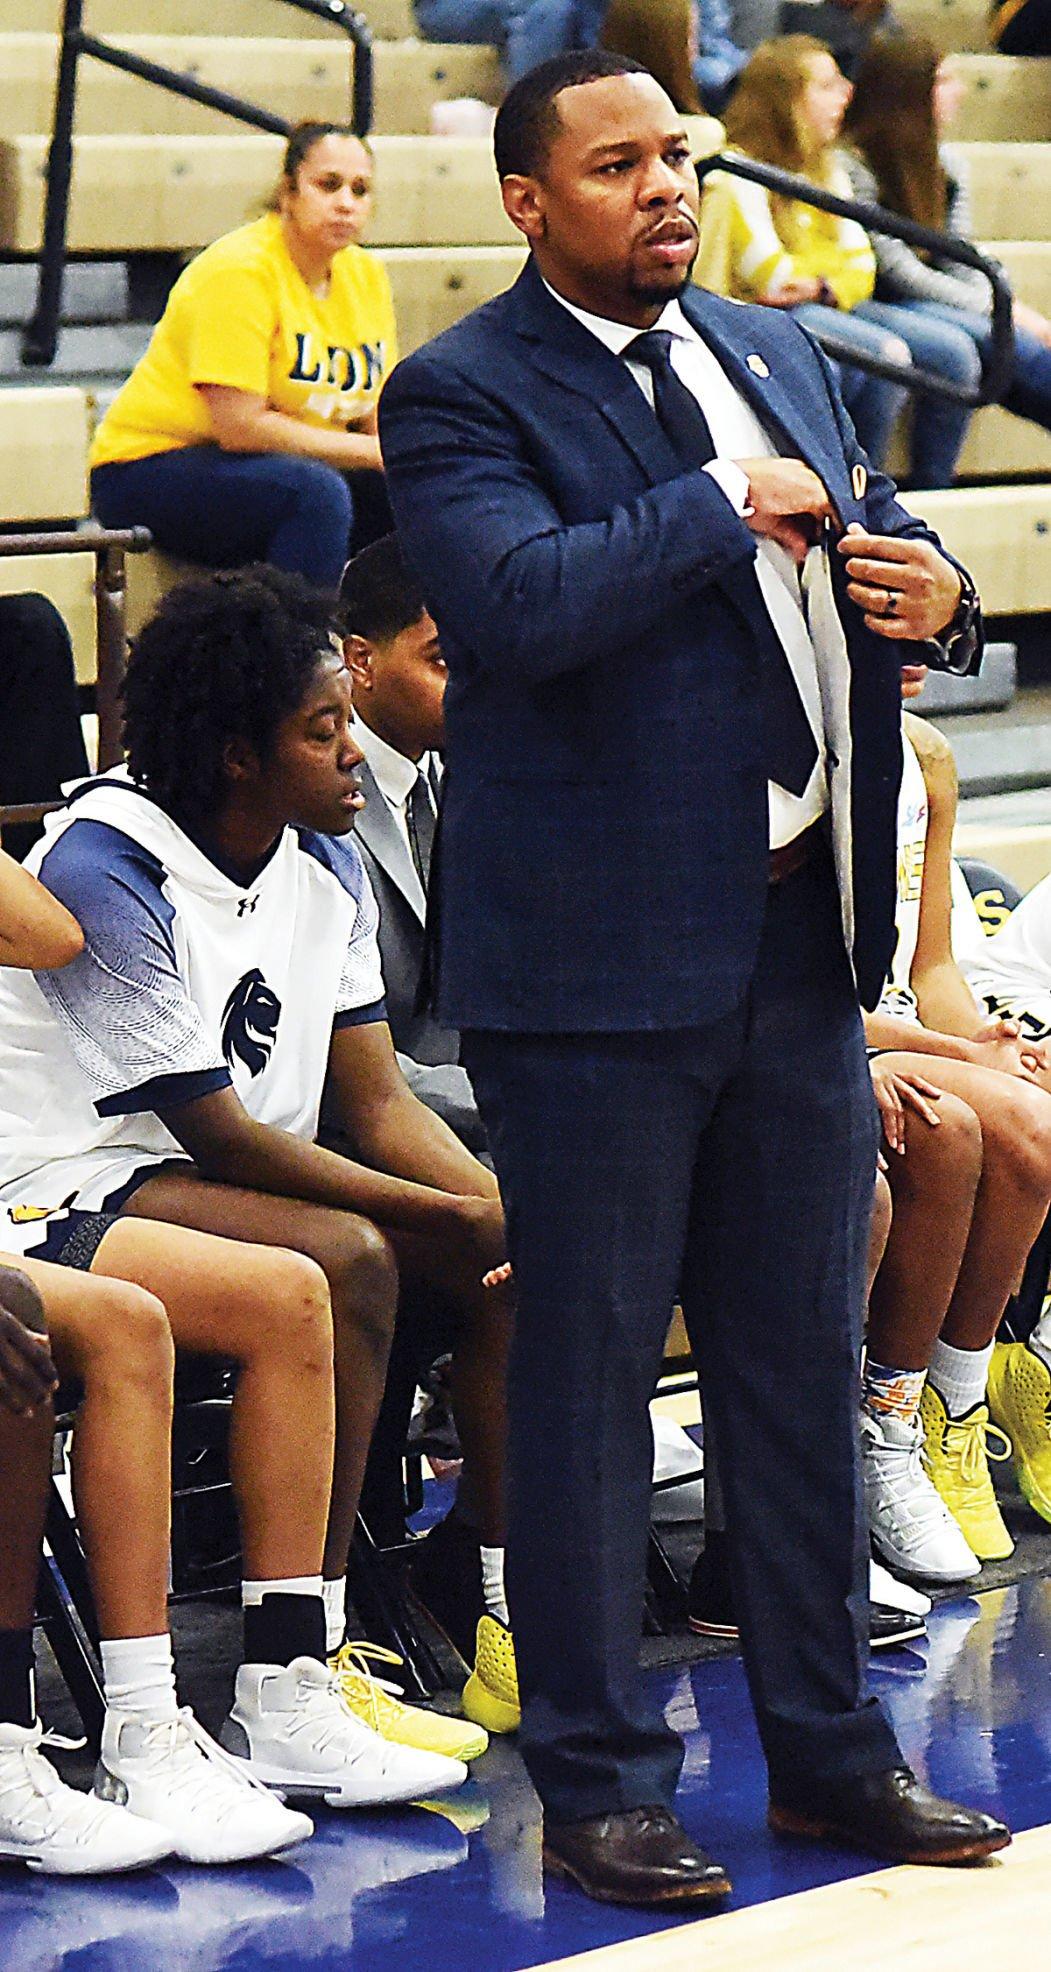 Jason Burton national coach of the week